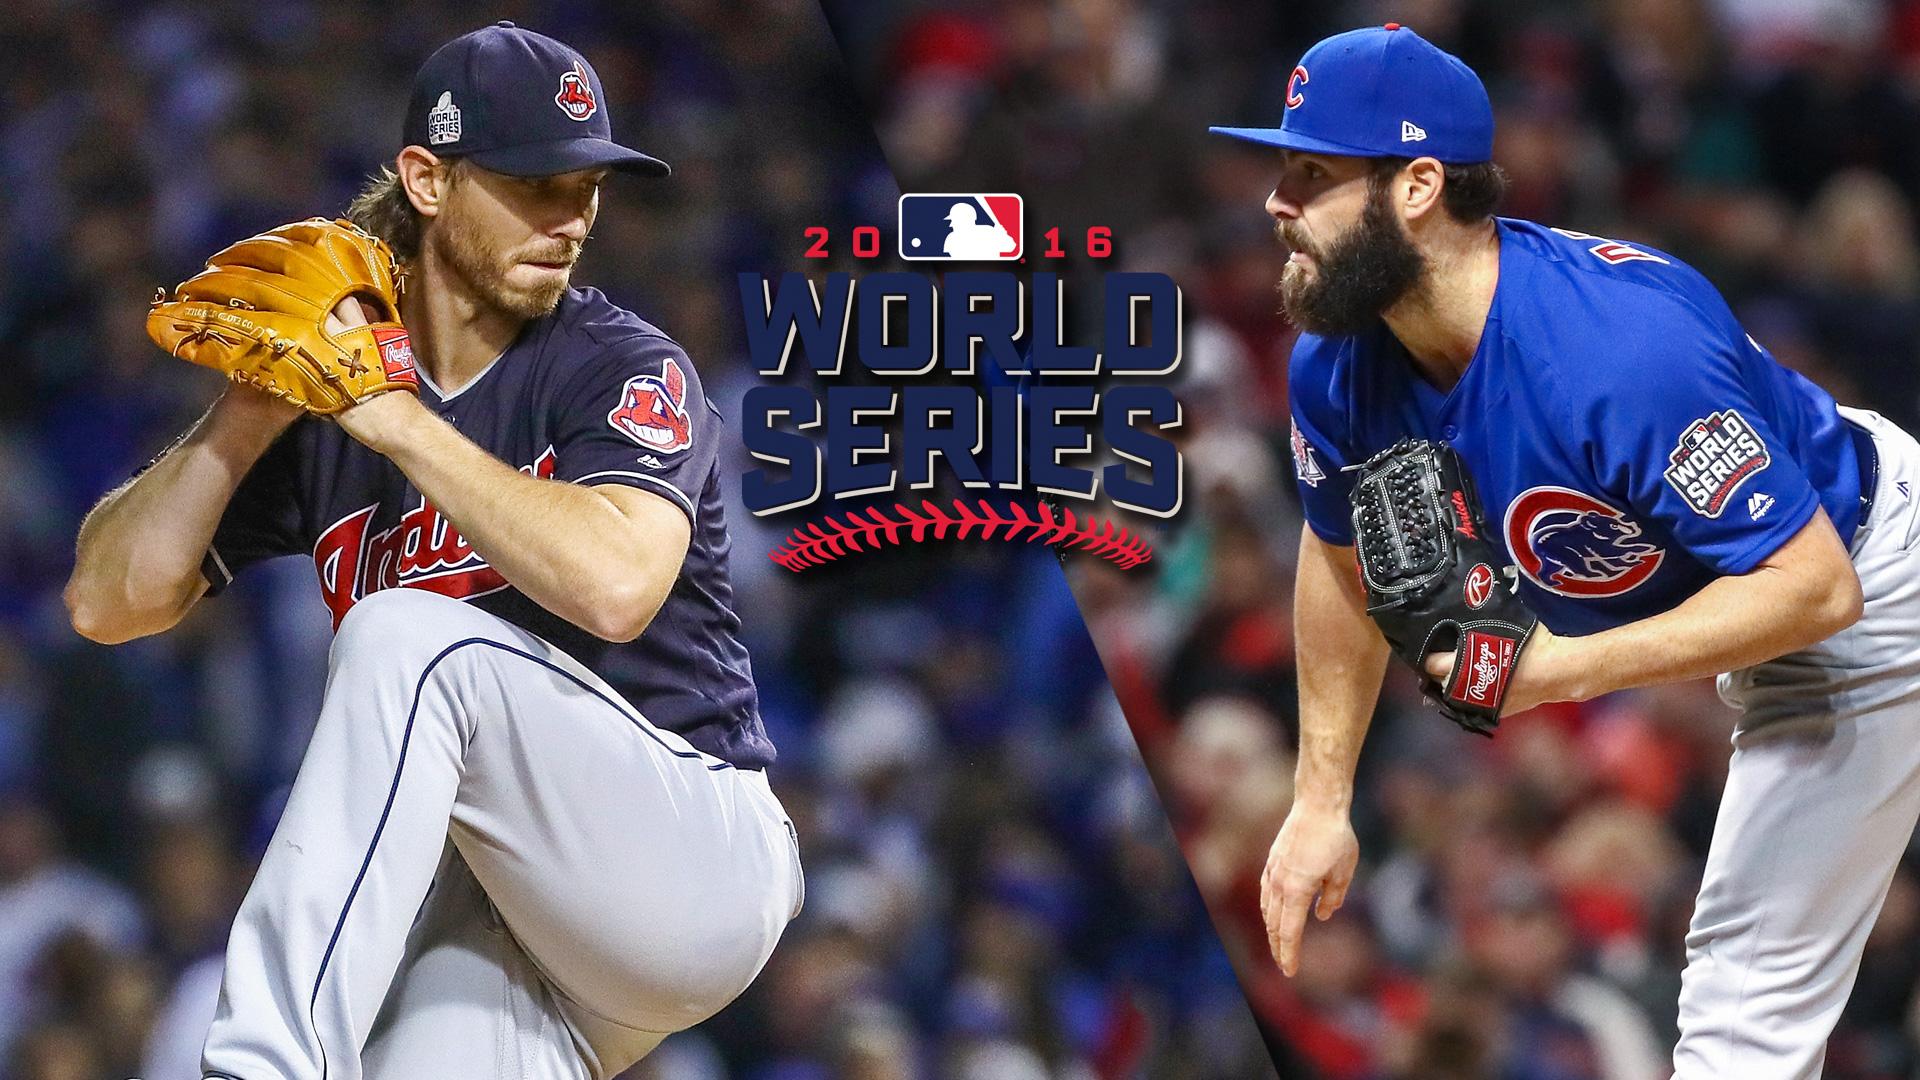 MLB Marlins vs Braves Box Score - Sep 23, 2020